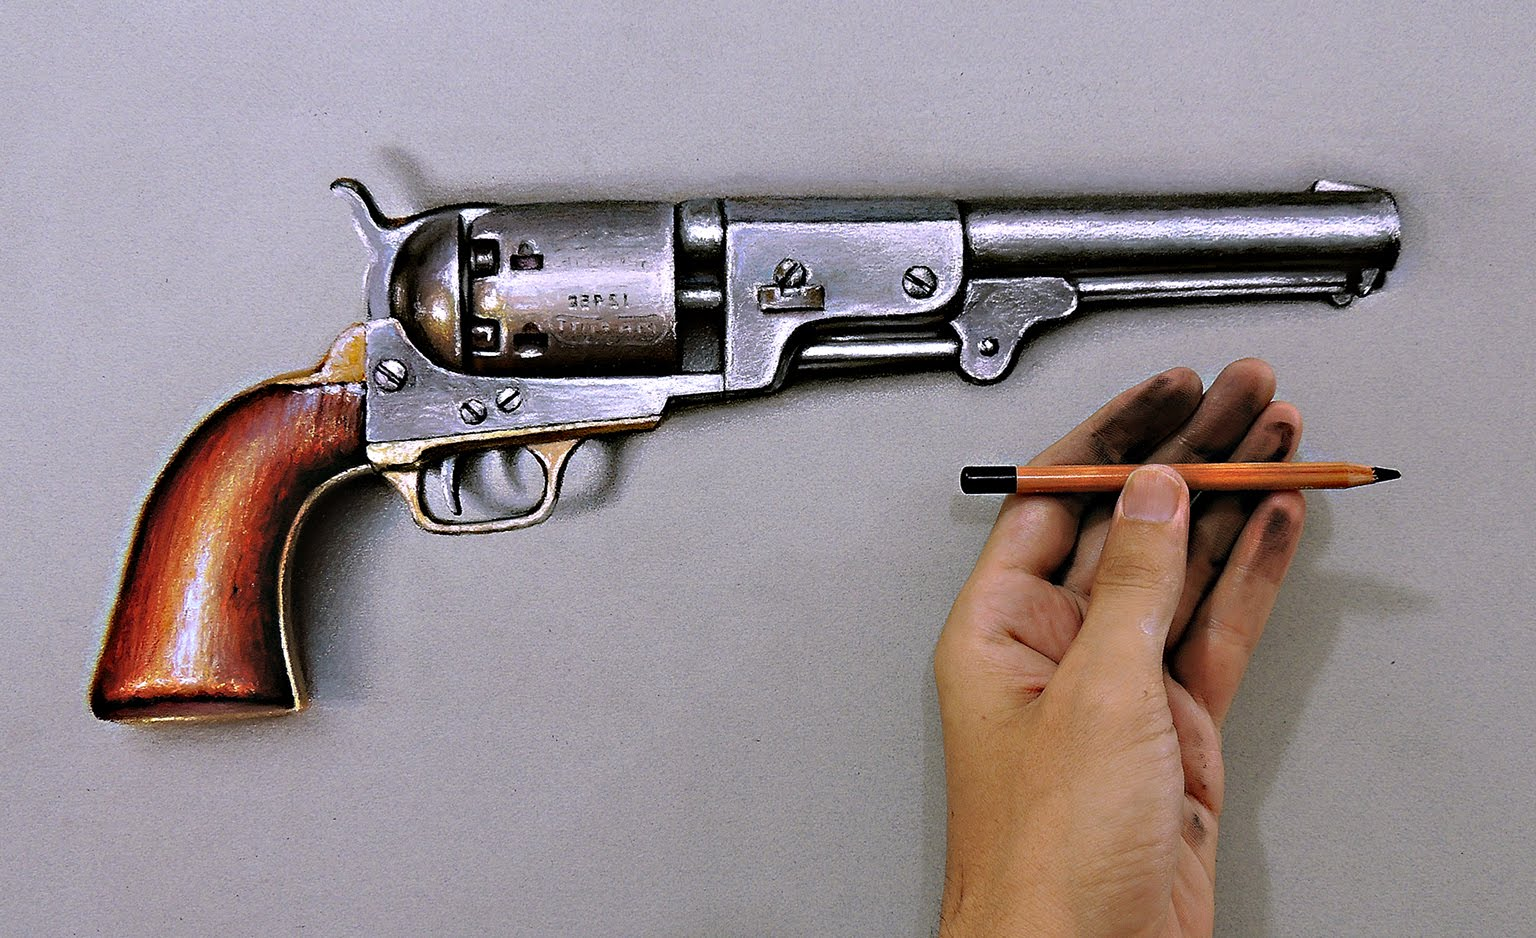 Drawn pistol realistic Crazy realistic gun How draw